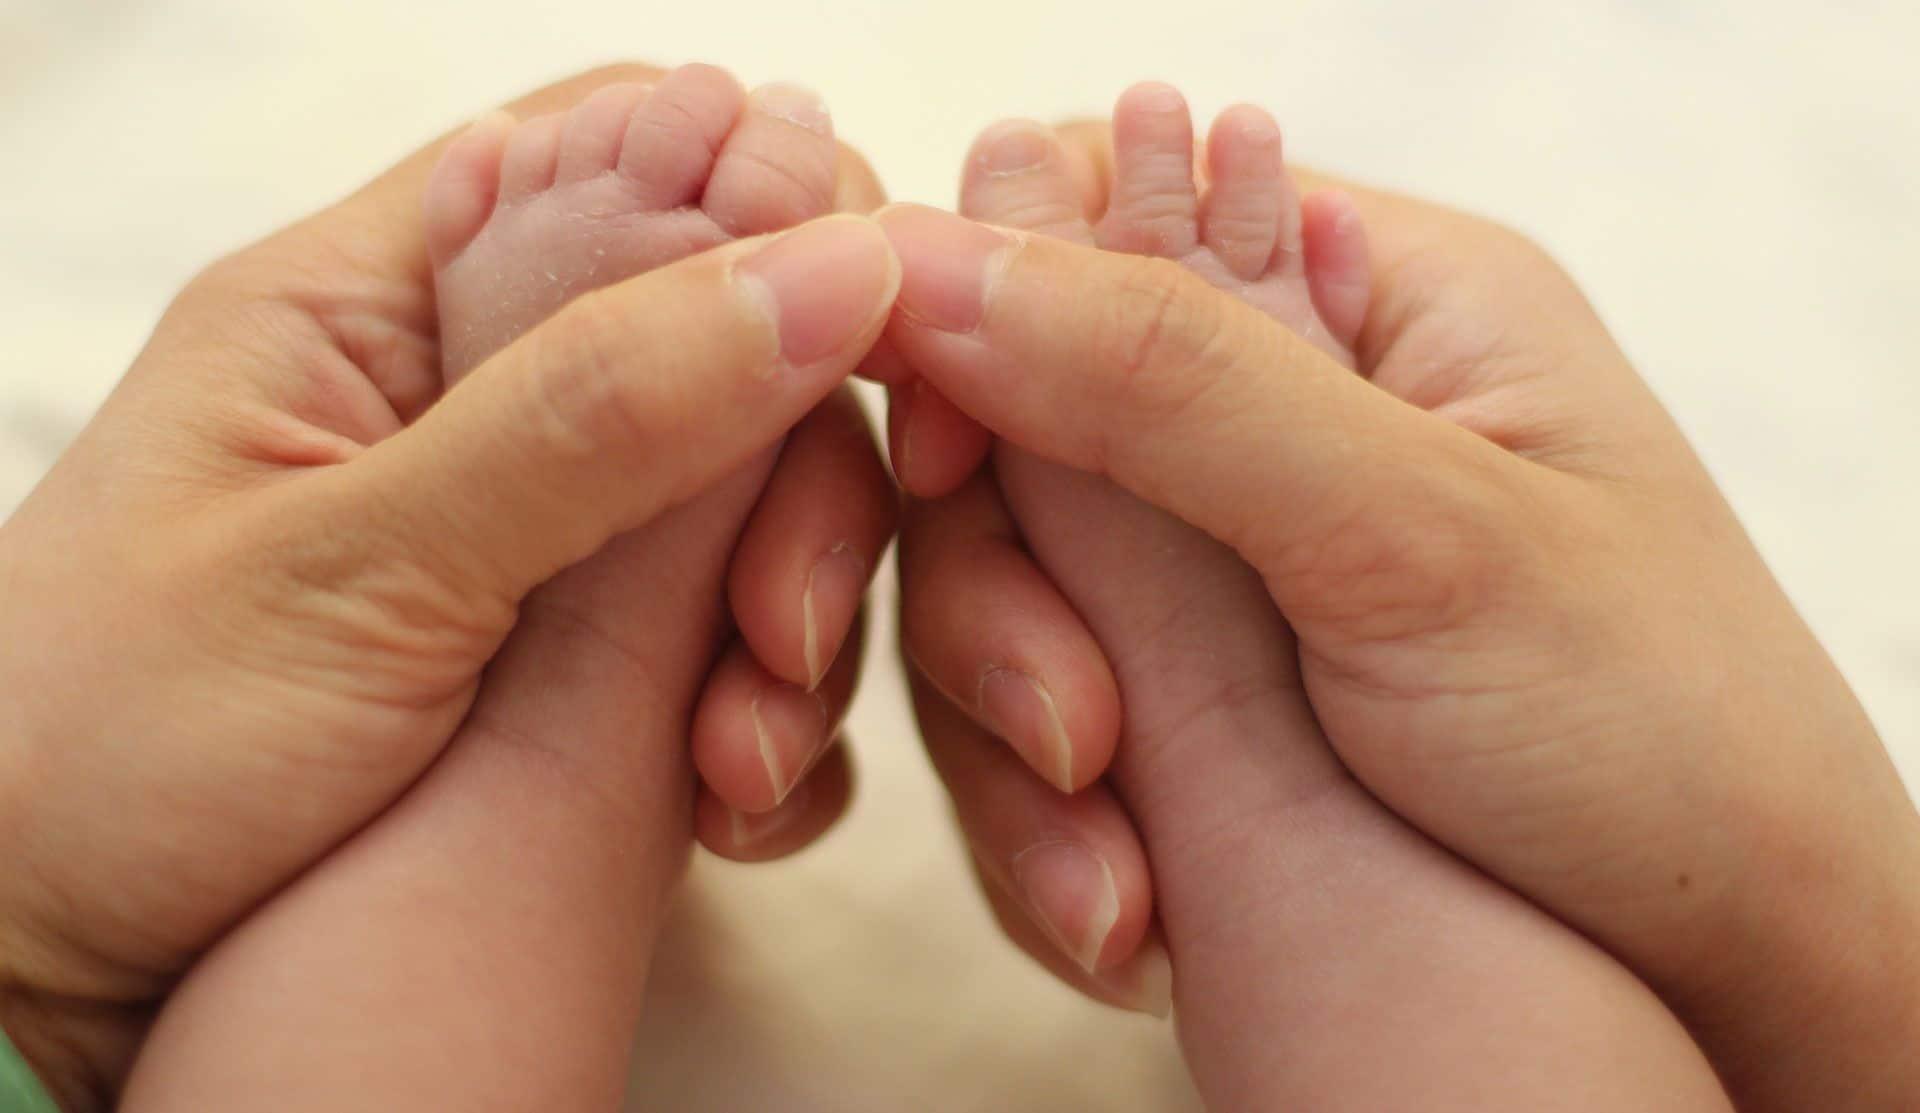 baby feet rehabilitation pediatric orthopedics